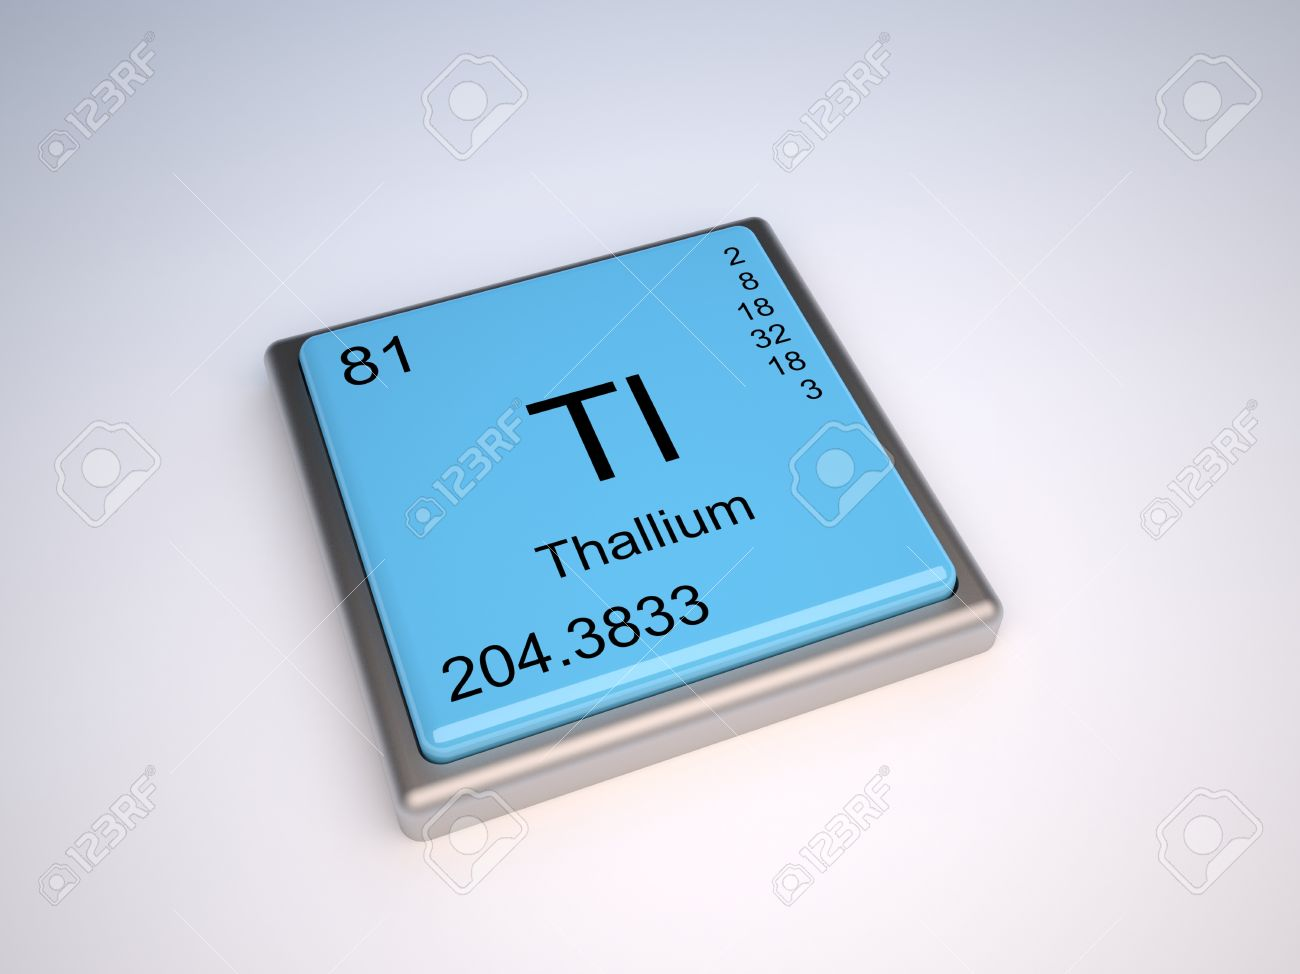 Thallium chemical element of the periodic table with symbol tl stock stock photo thallium chemical element of the periodic table with symbol tl urtaz Choice Image